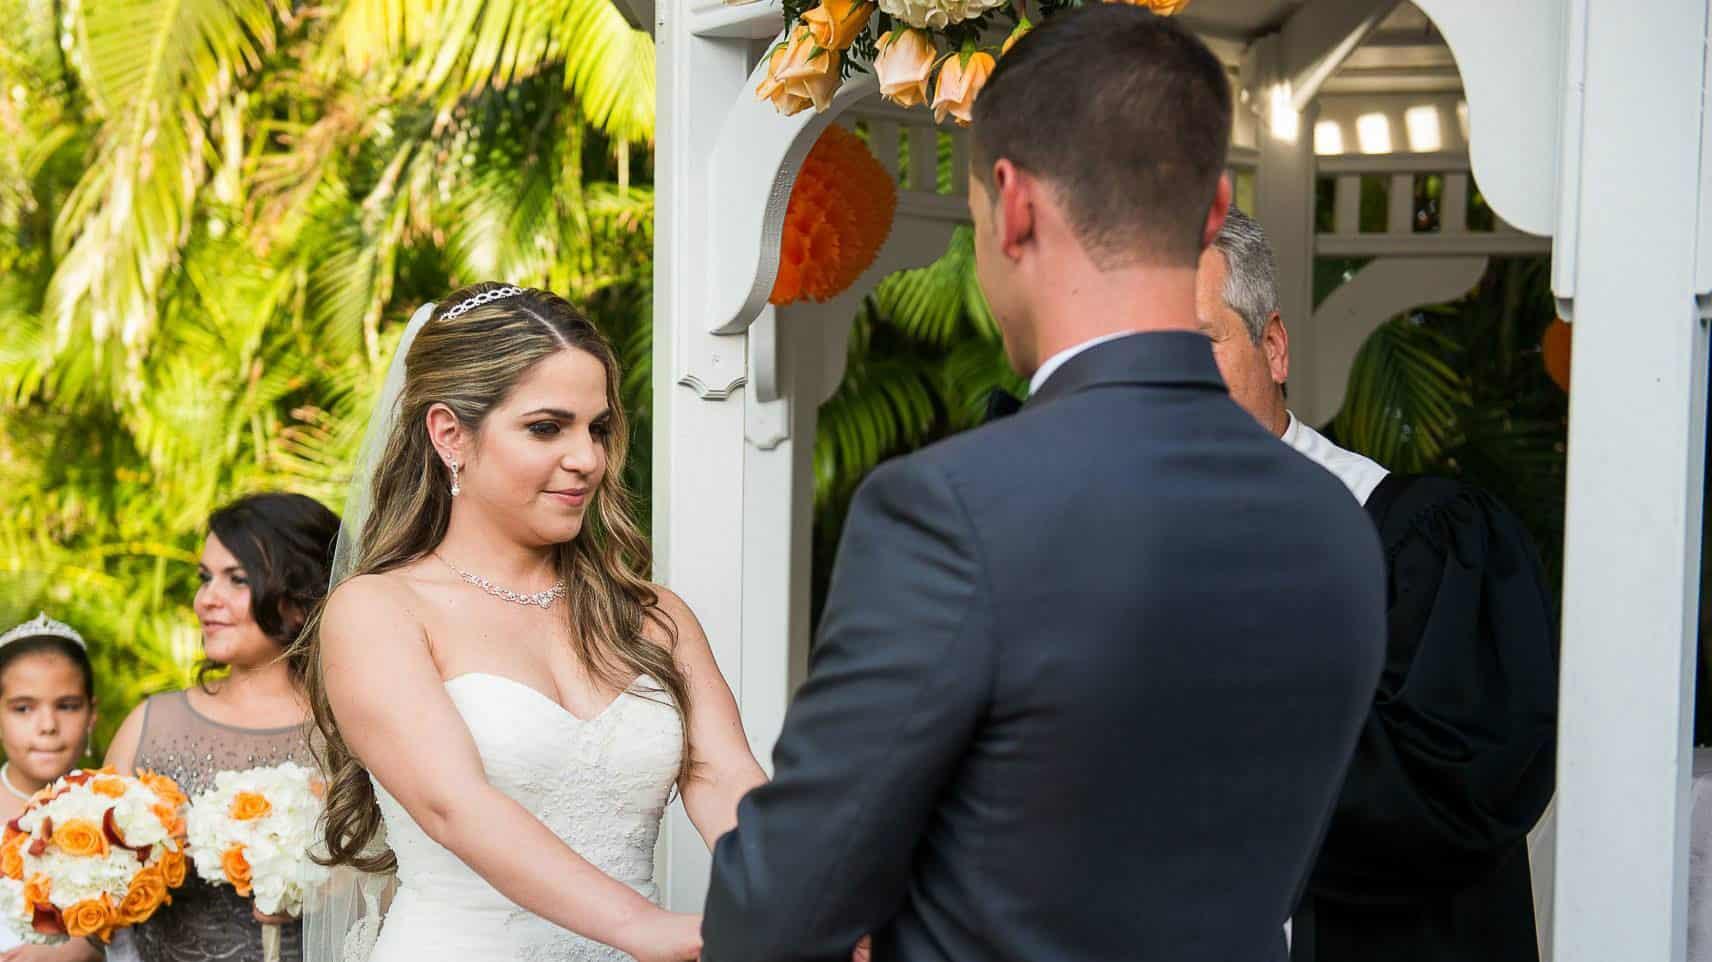 2-18-16-summer-events-wedding-closeup